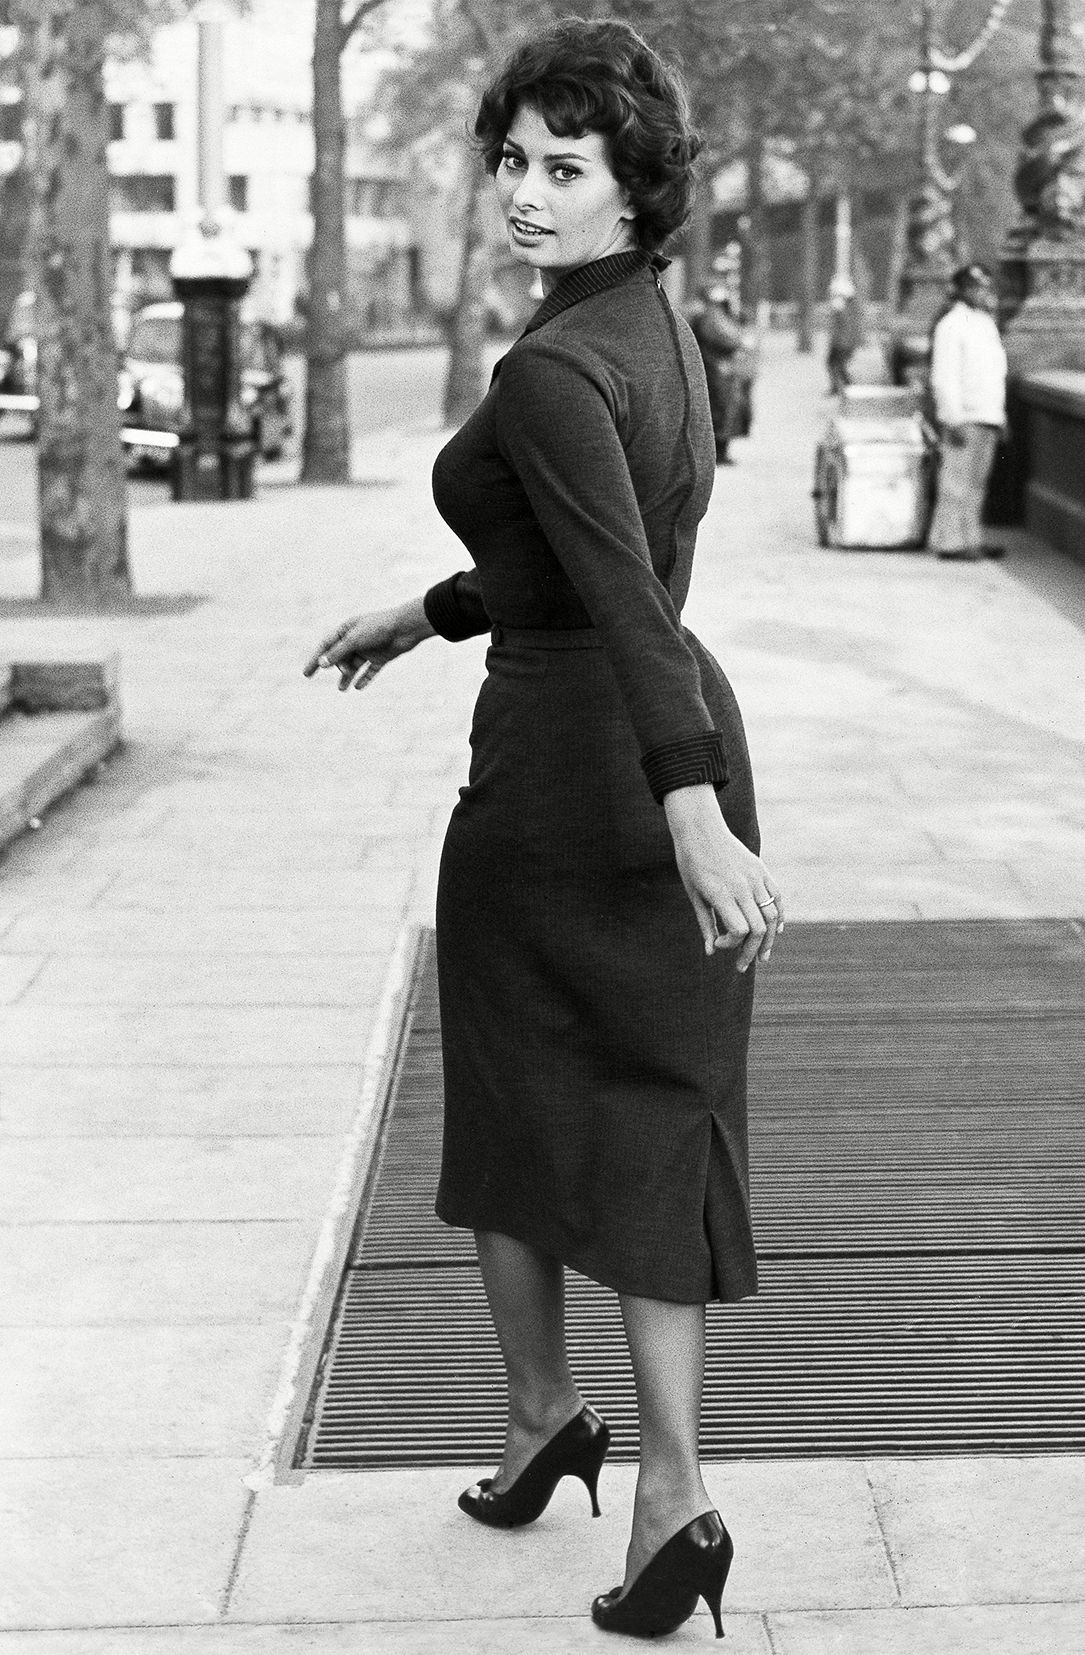 Sophia Loren walking the streets of London circa 1957. // #classicbeauty #streetstyle #fashion